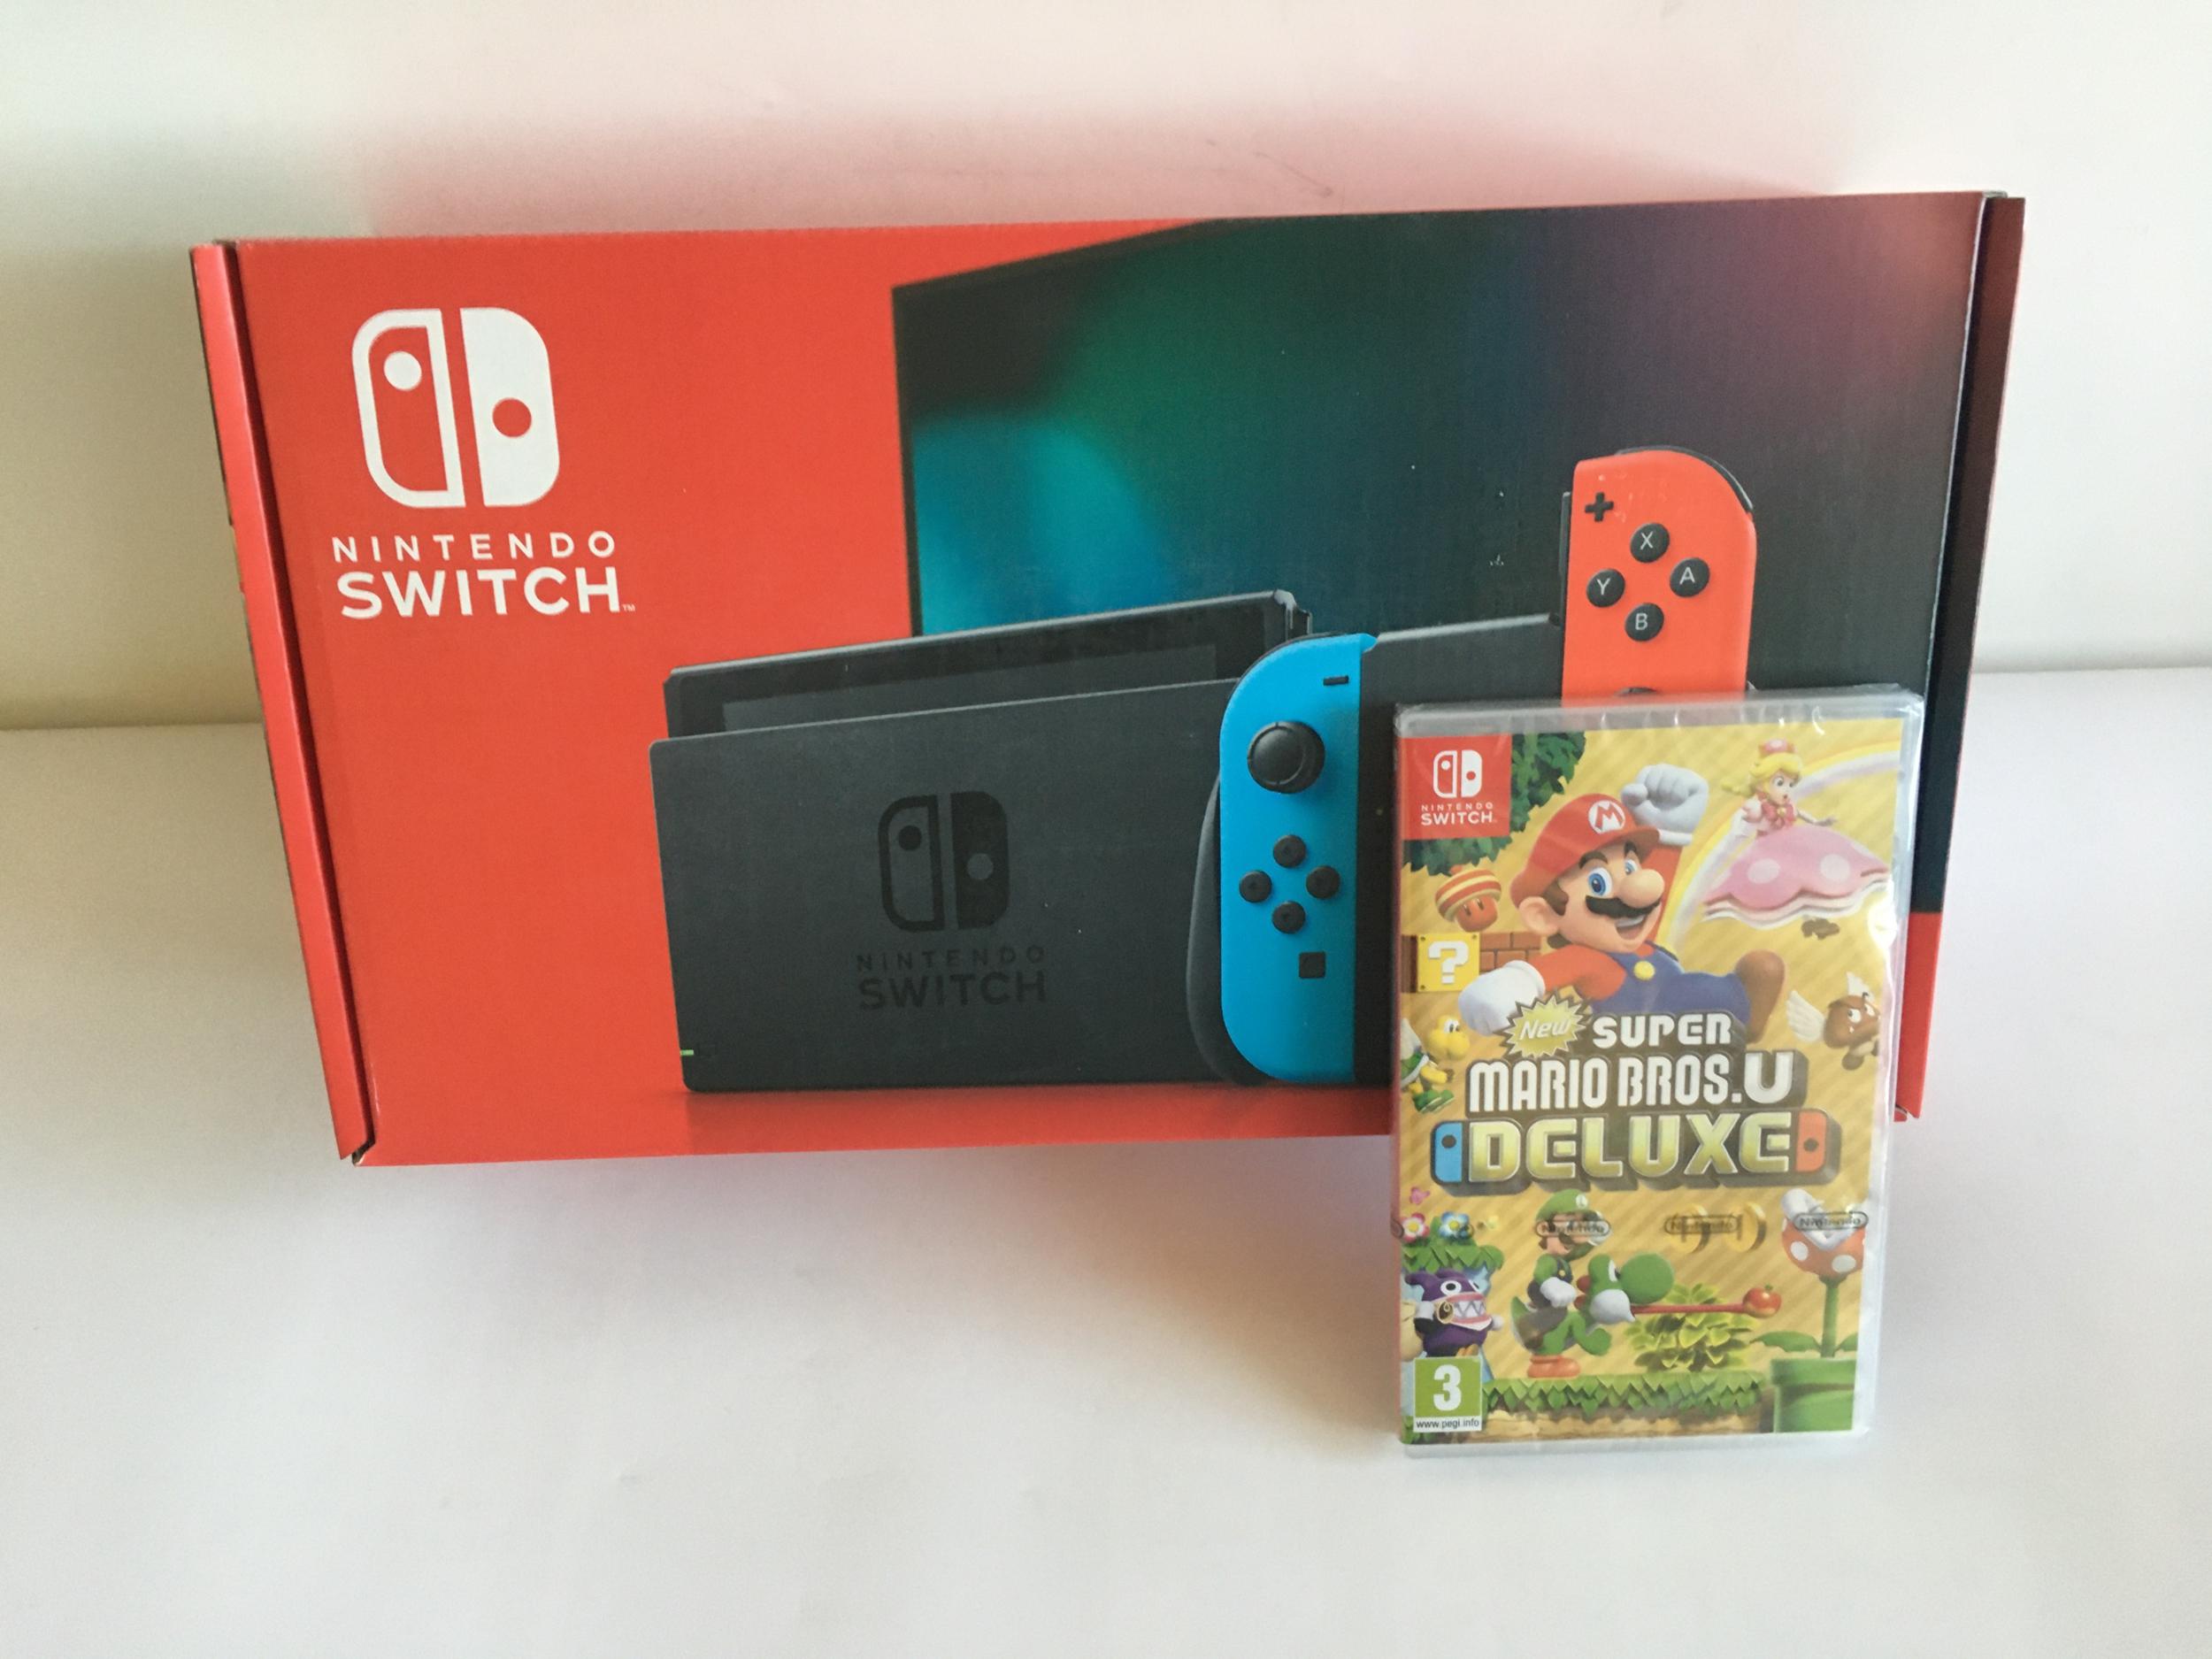 Nintendo Switch Bleu fluo/Rouge fluo - Modèle 2019 + Super Mario Bros.U DELUXE